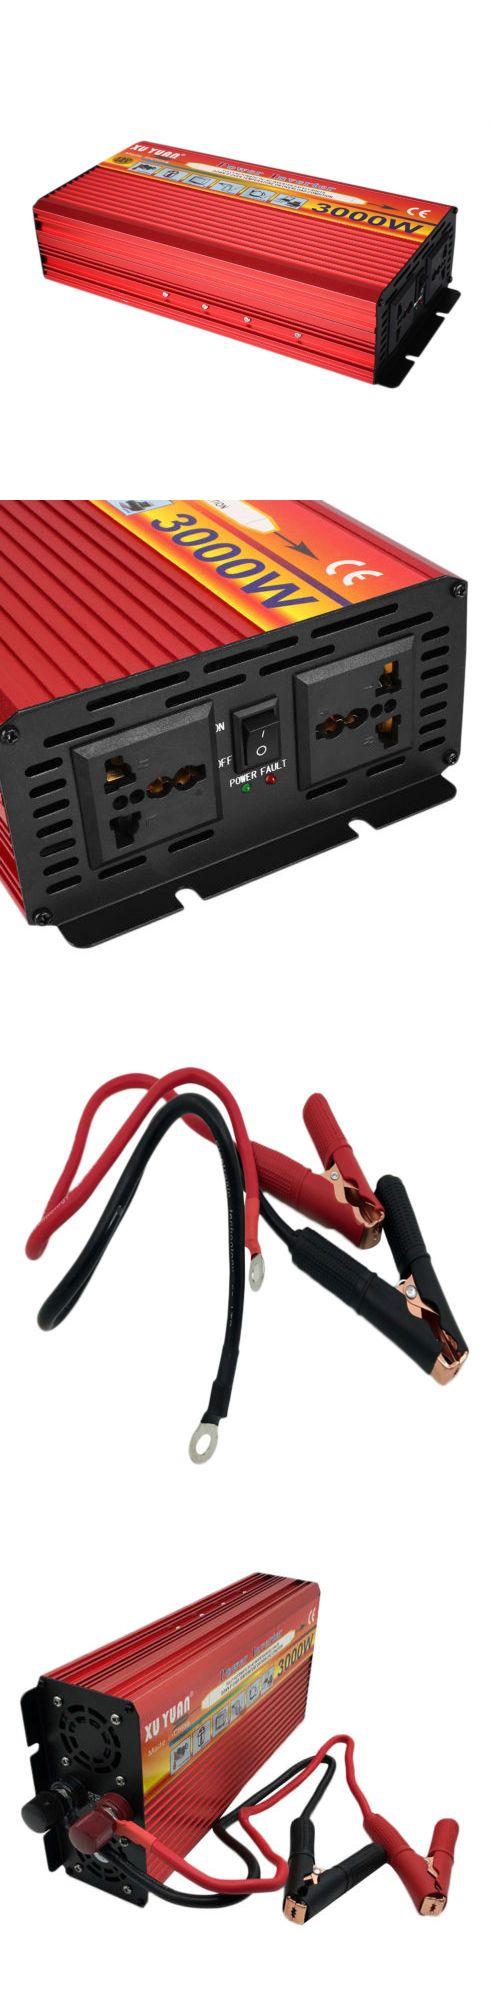 best ideas about inverter ac solar power power inverters 3000w watts peak car power inverter converter 12v dc to 220v ac